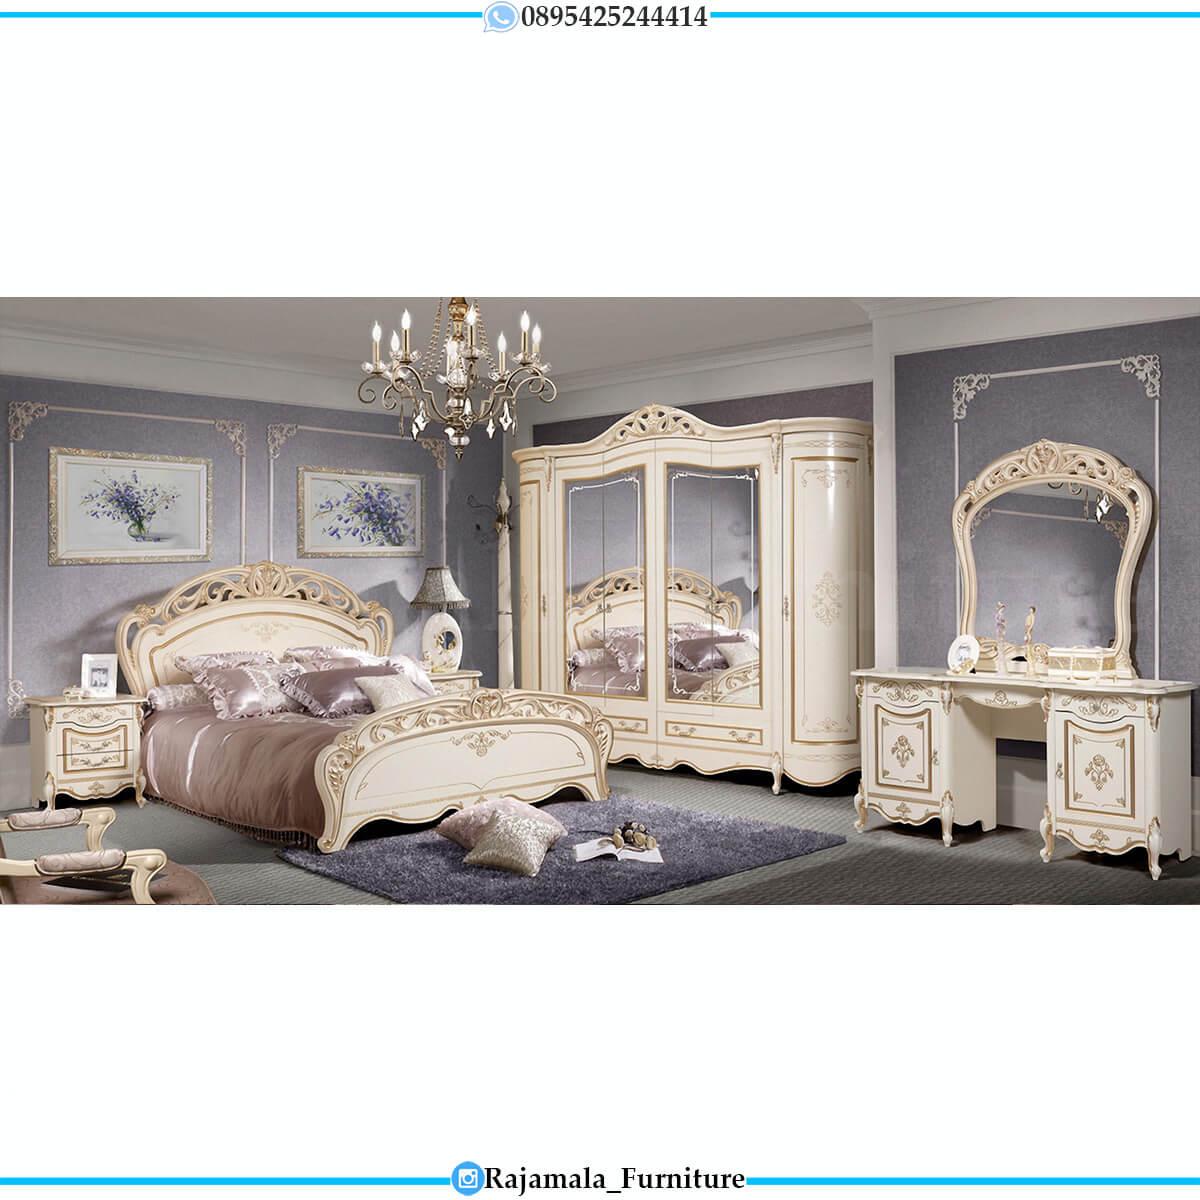 New Tempat Tidur Mewah Jepara Classic Luxury Furniture Jakarta RM-0702